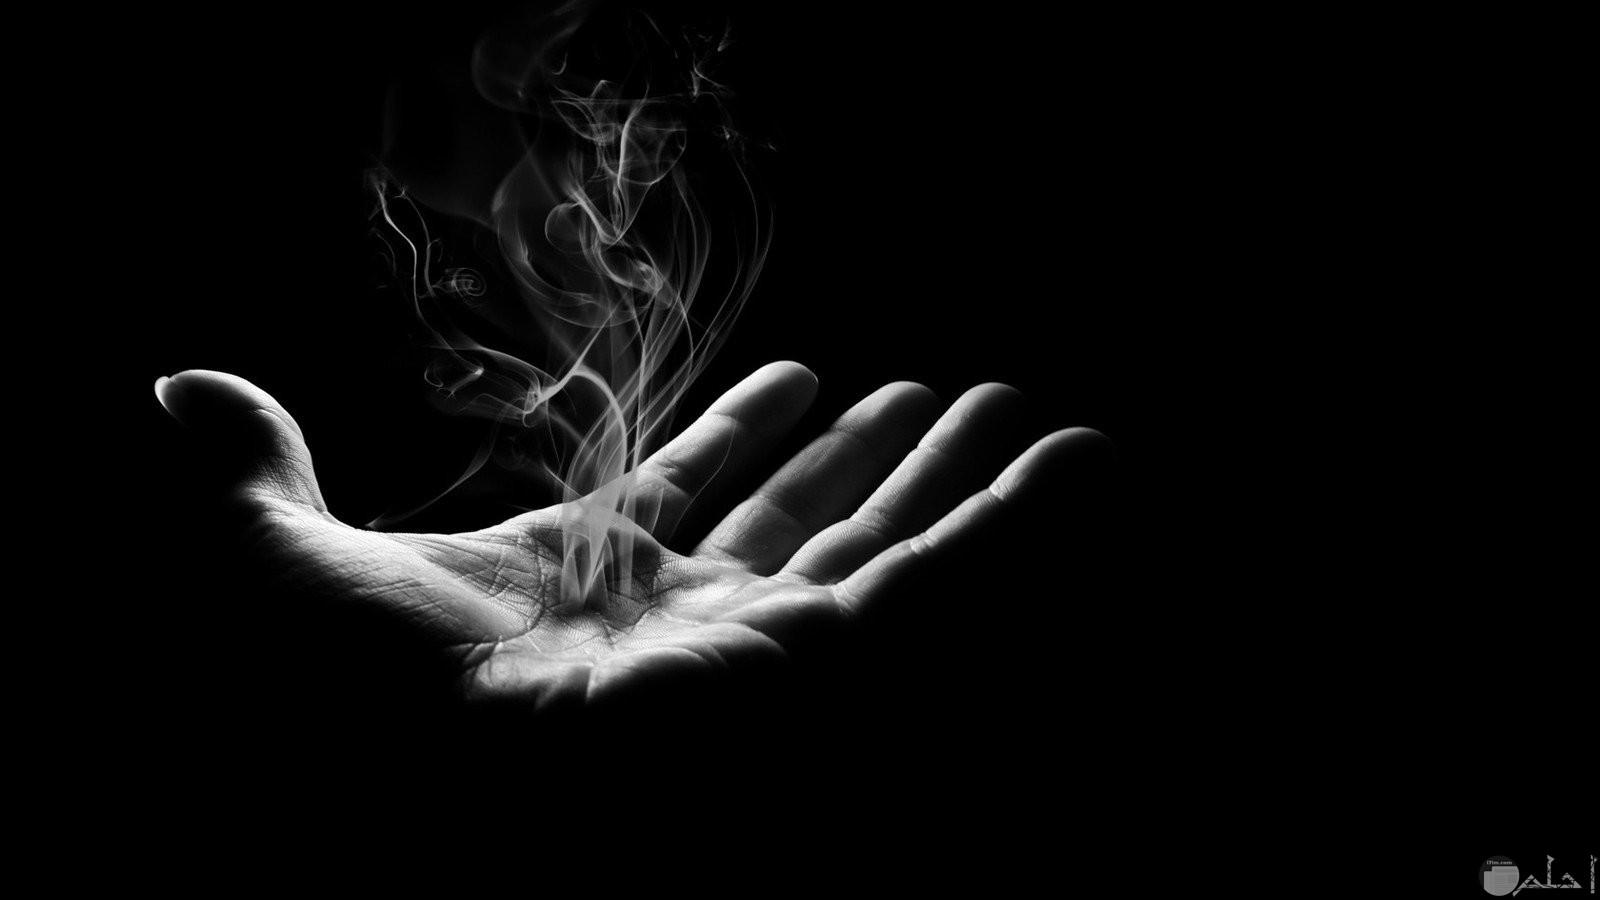 يد يخرج منها دخان.